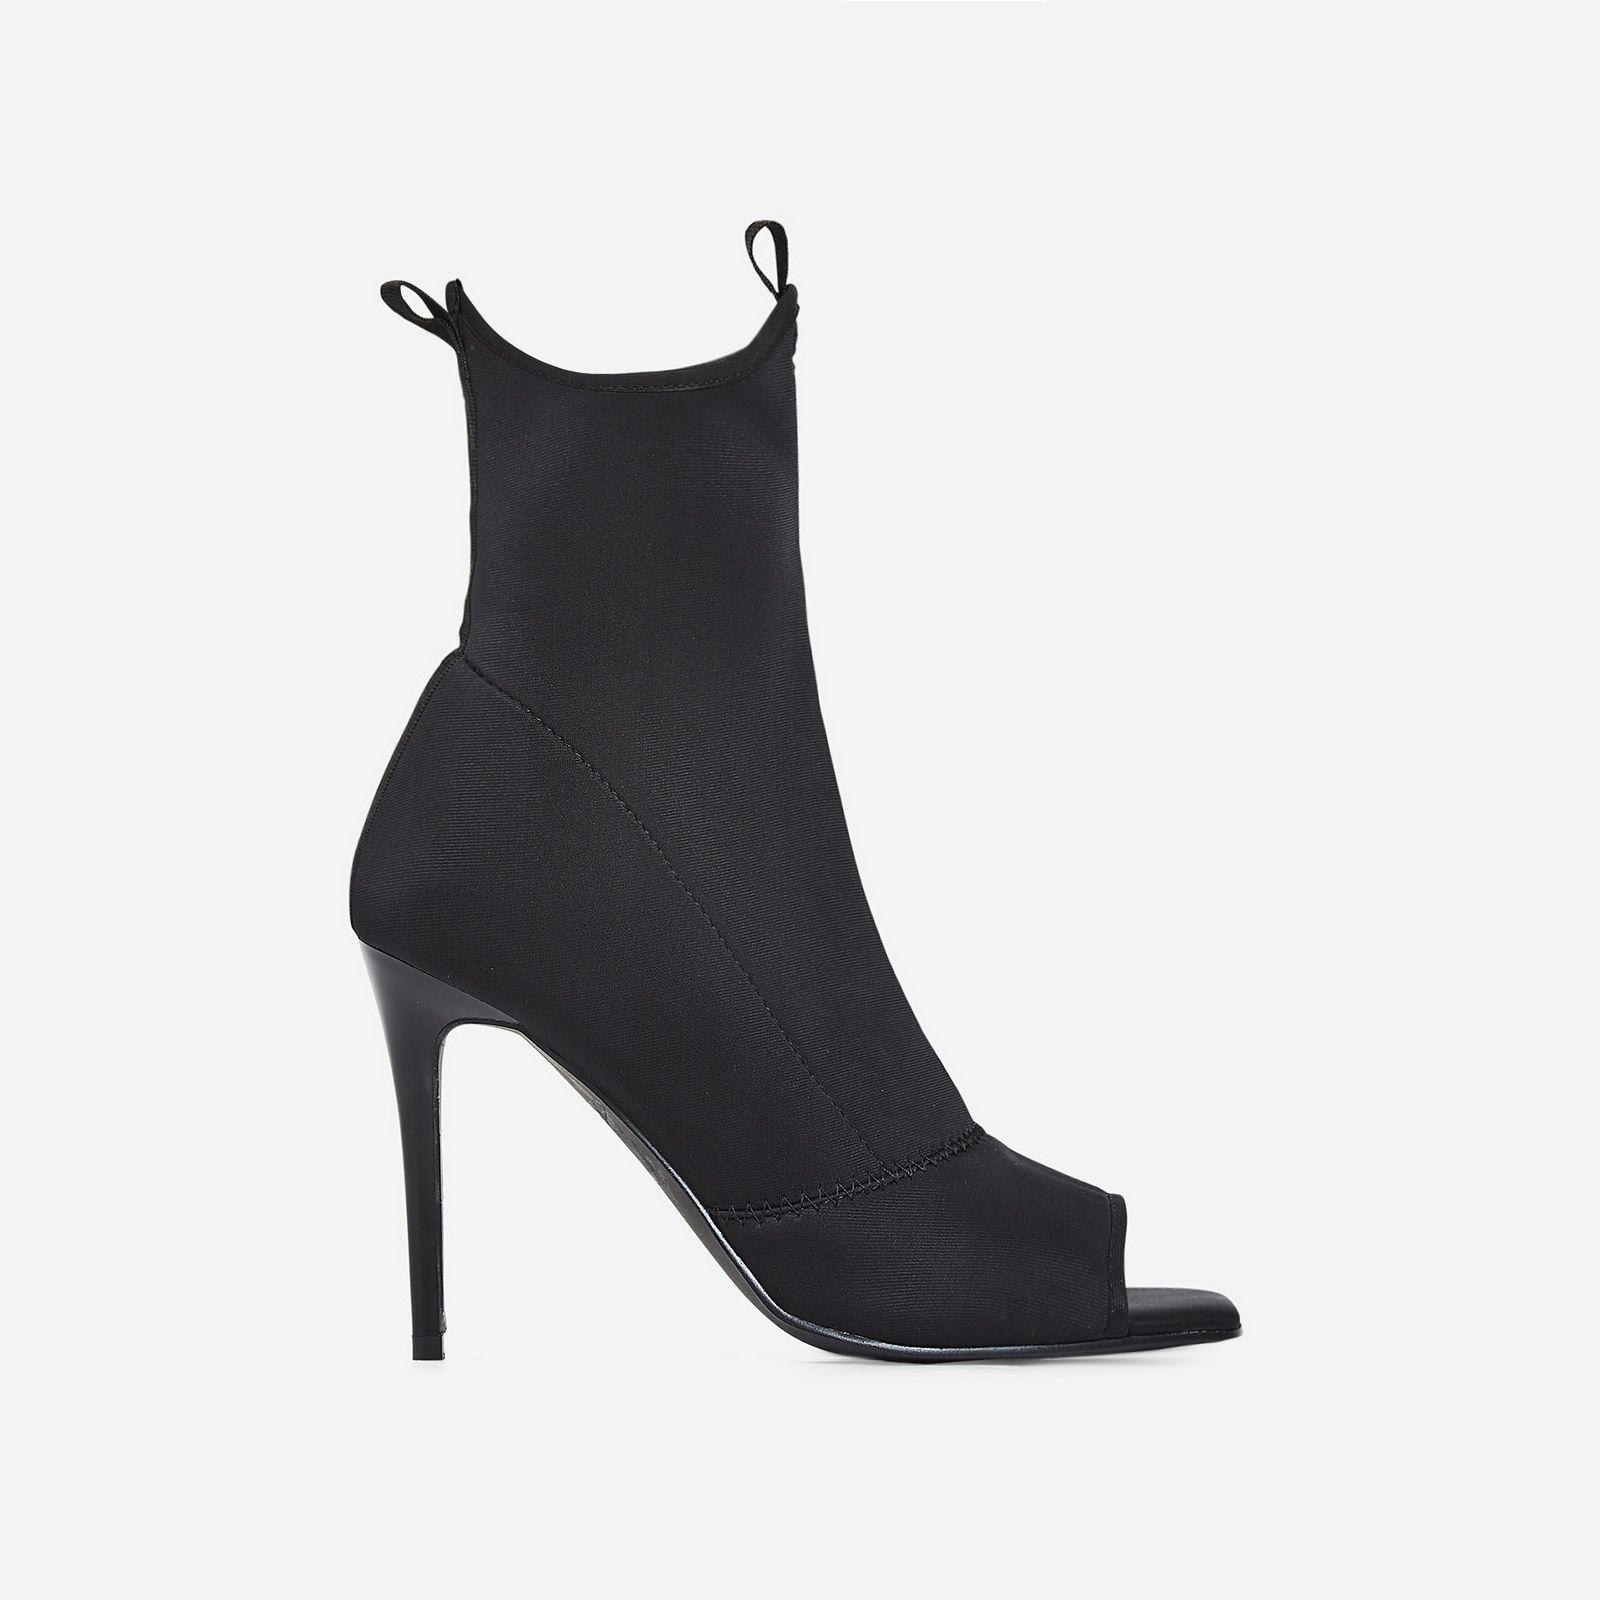 Carter Peep Toe Ankle Sock Boot In Black Lycra